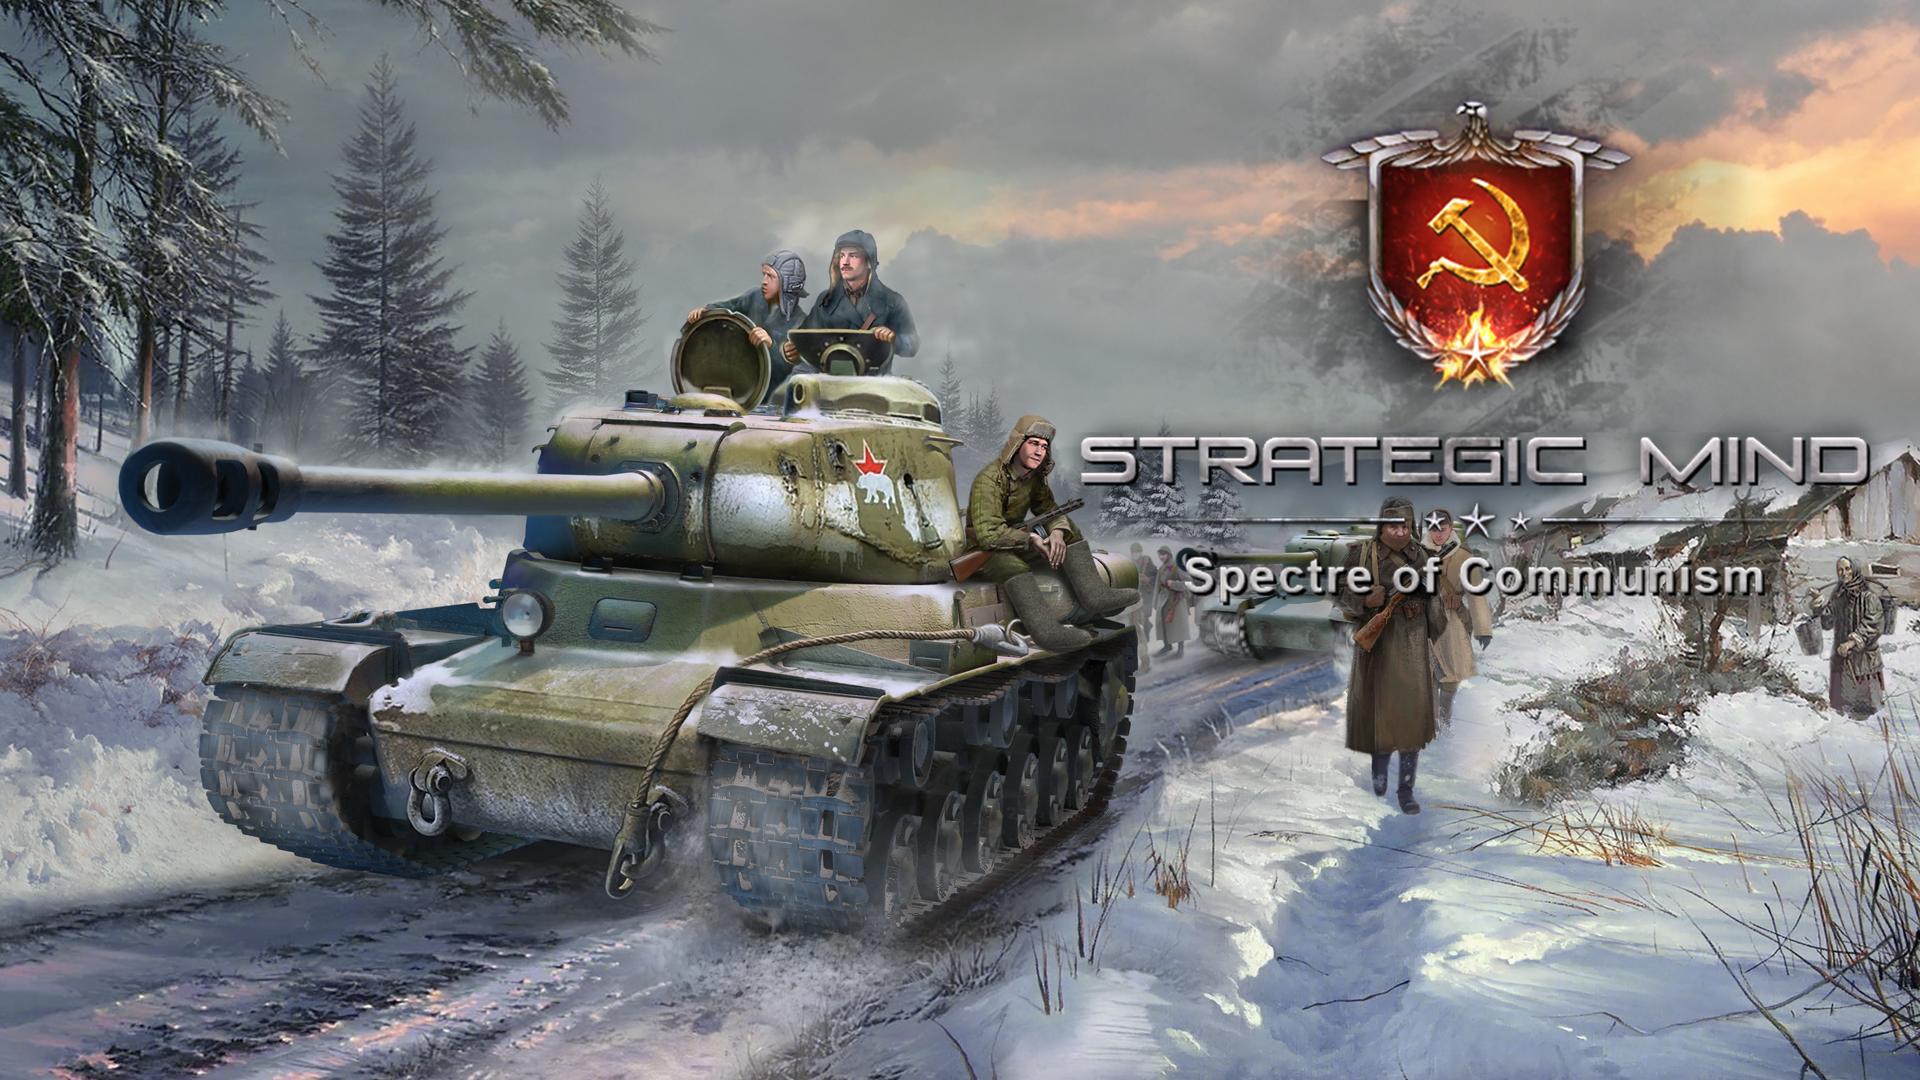 Spectre of Communism